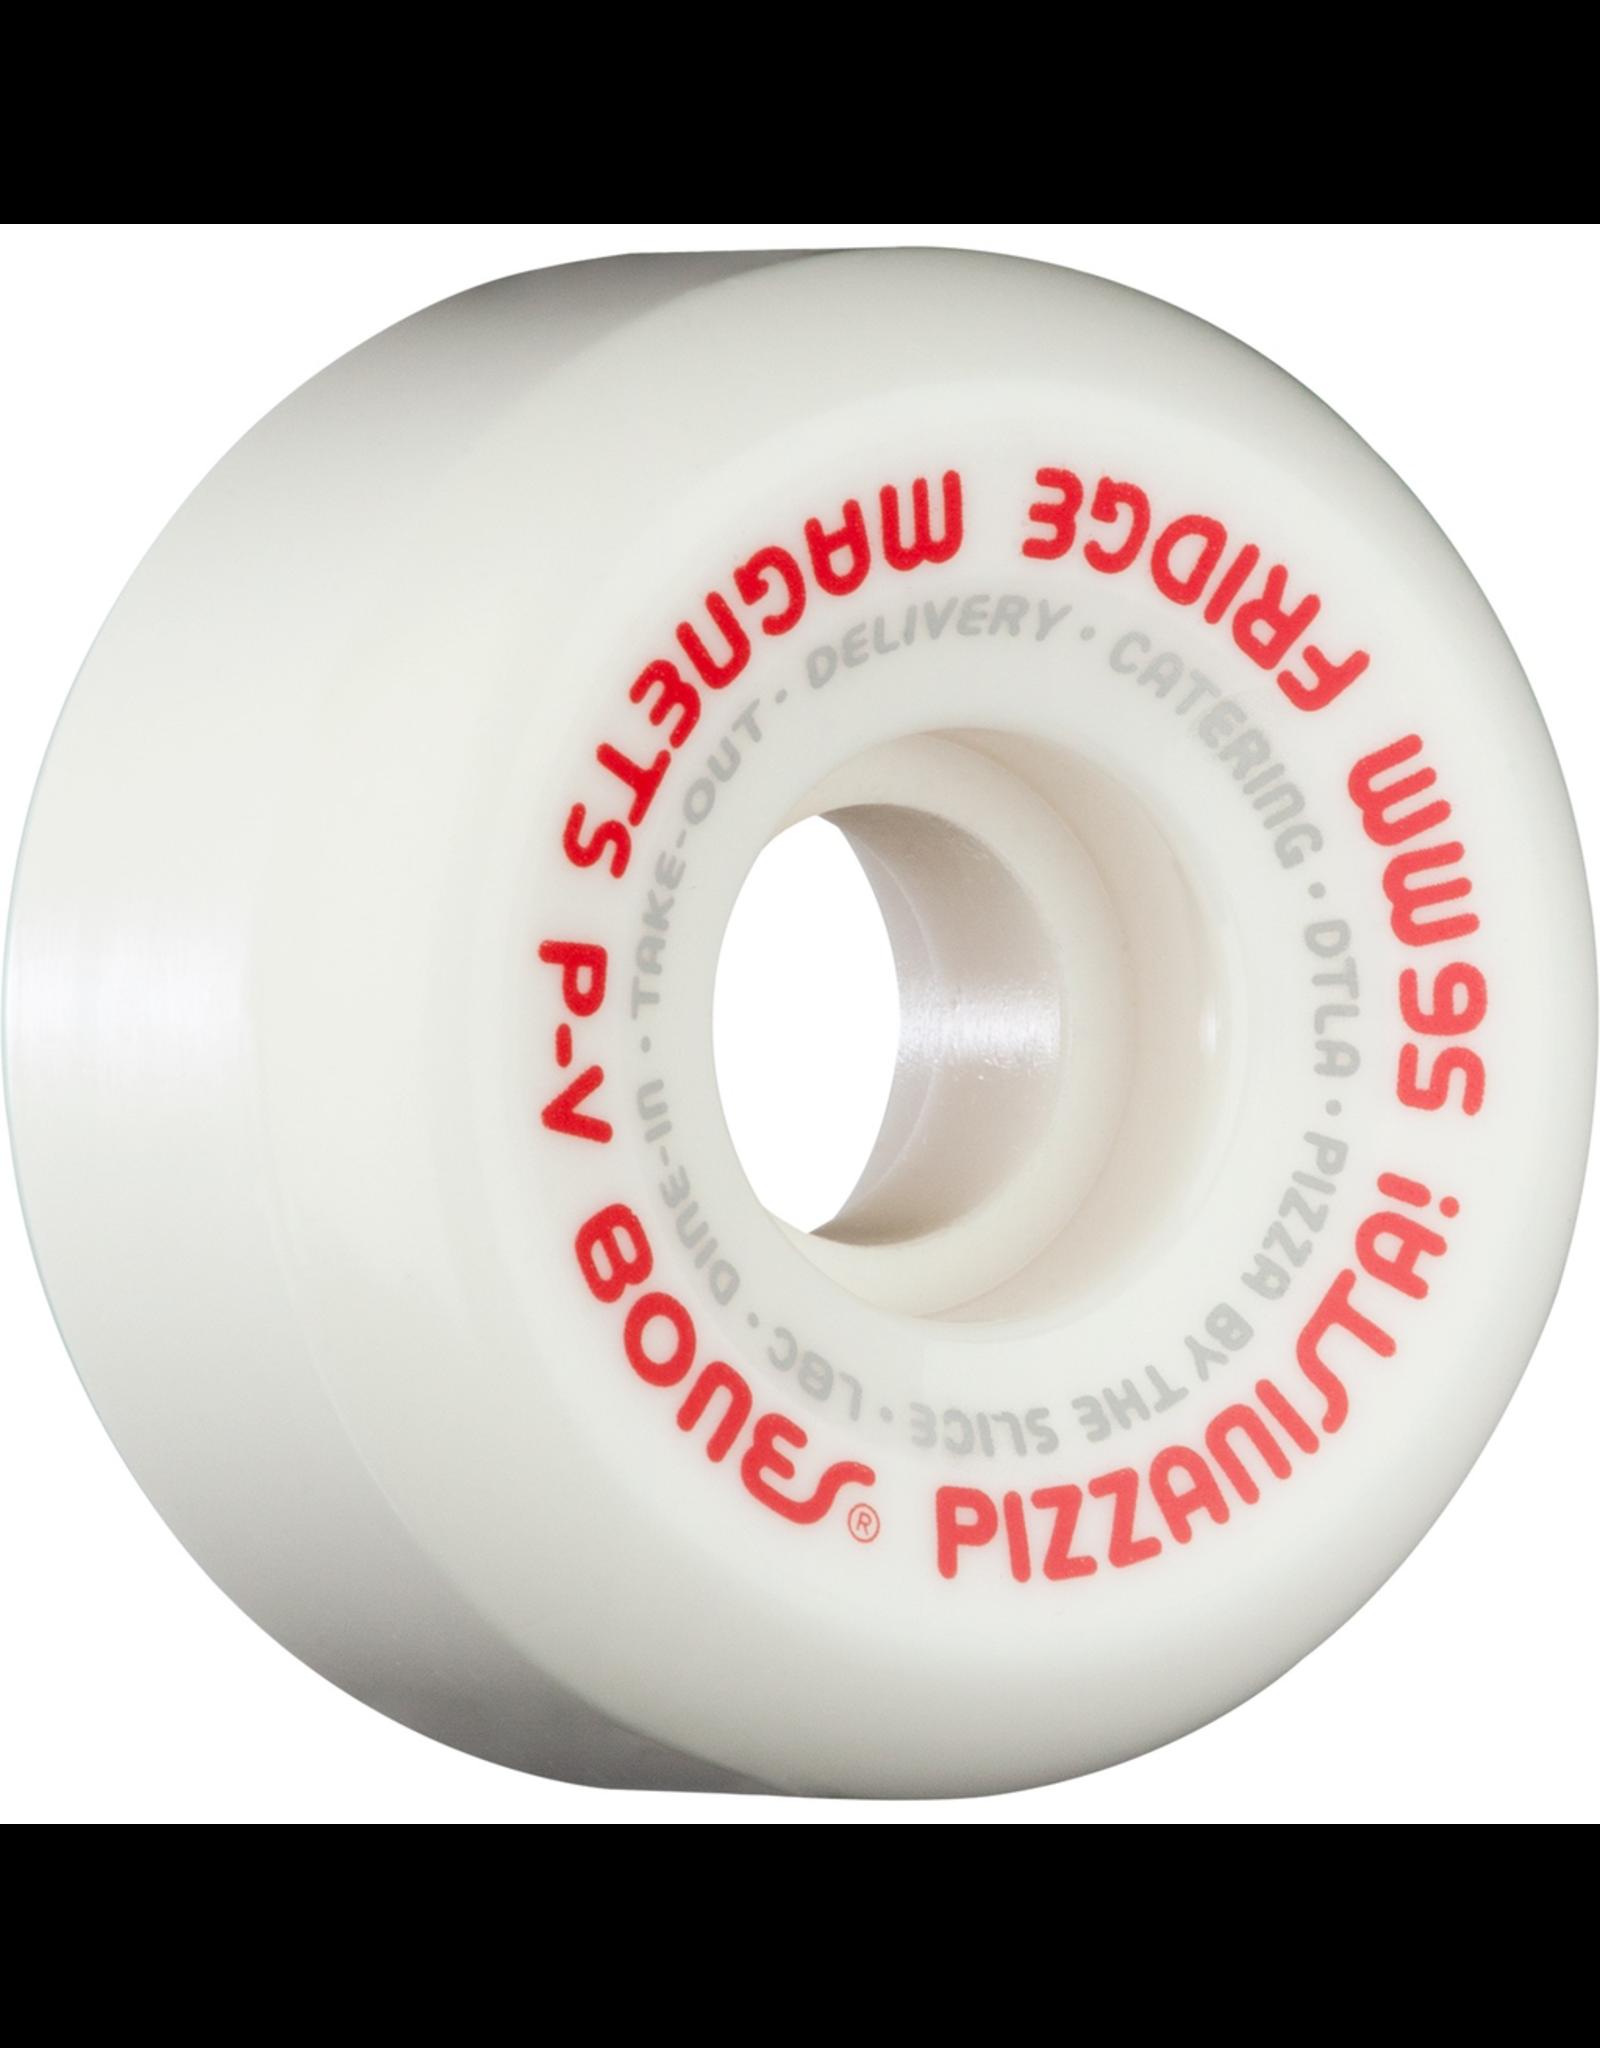 BONES Bones Wheels SPF P5 Pizzanista! Fridge Magnetsq White / Red Skateboard Wheels - 56mm 104a (Set of 4)